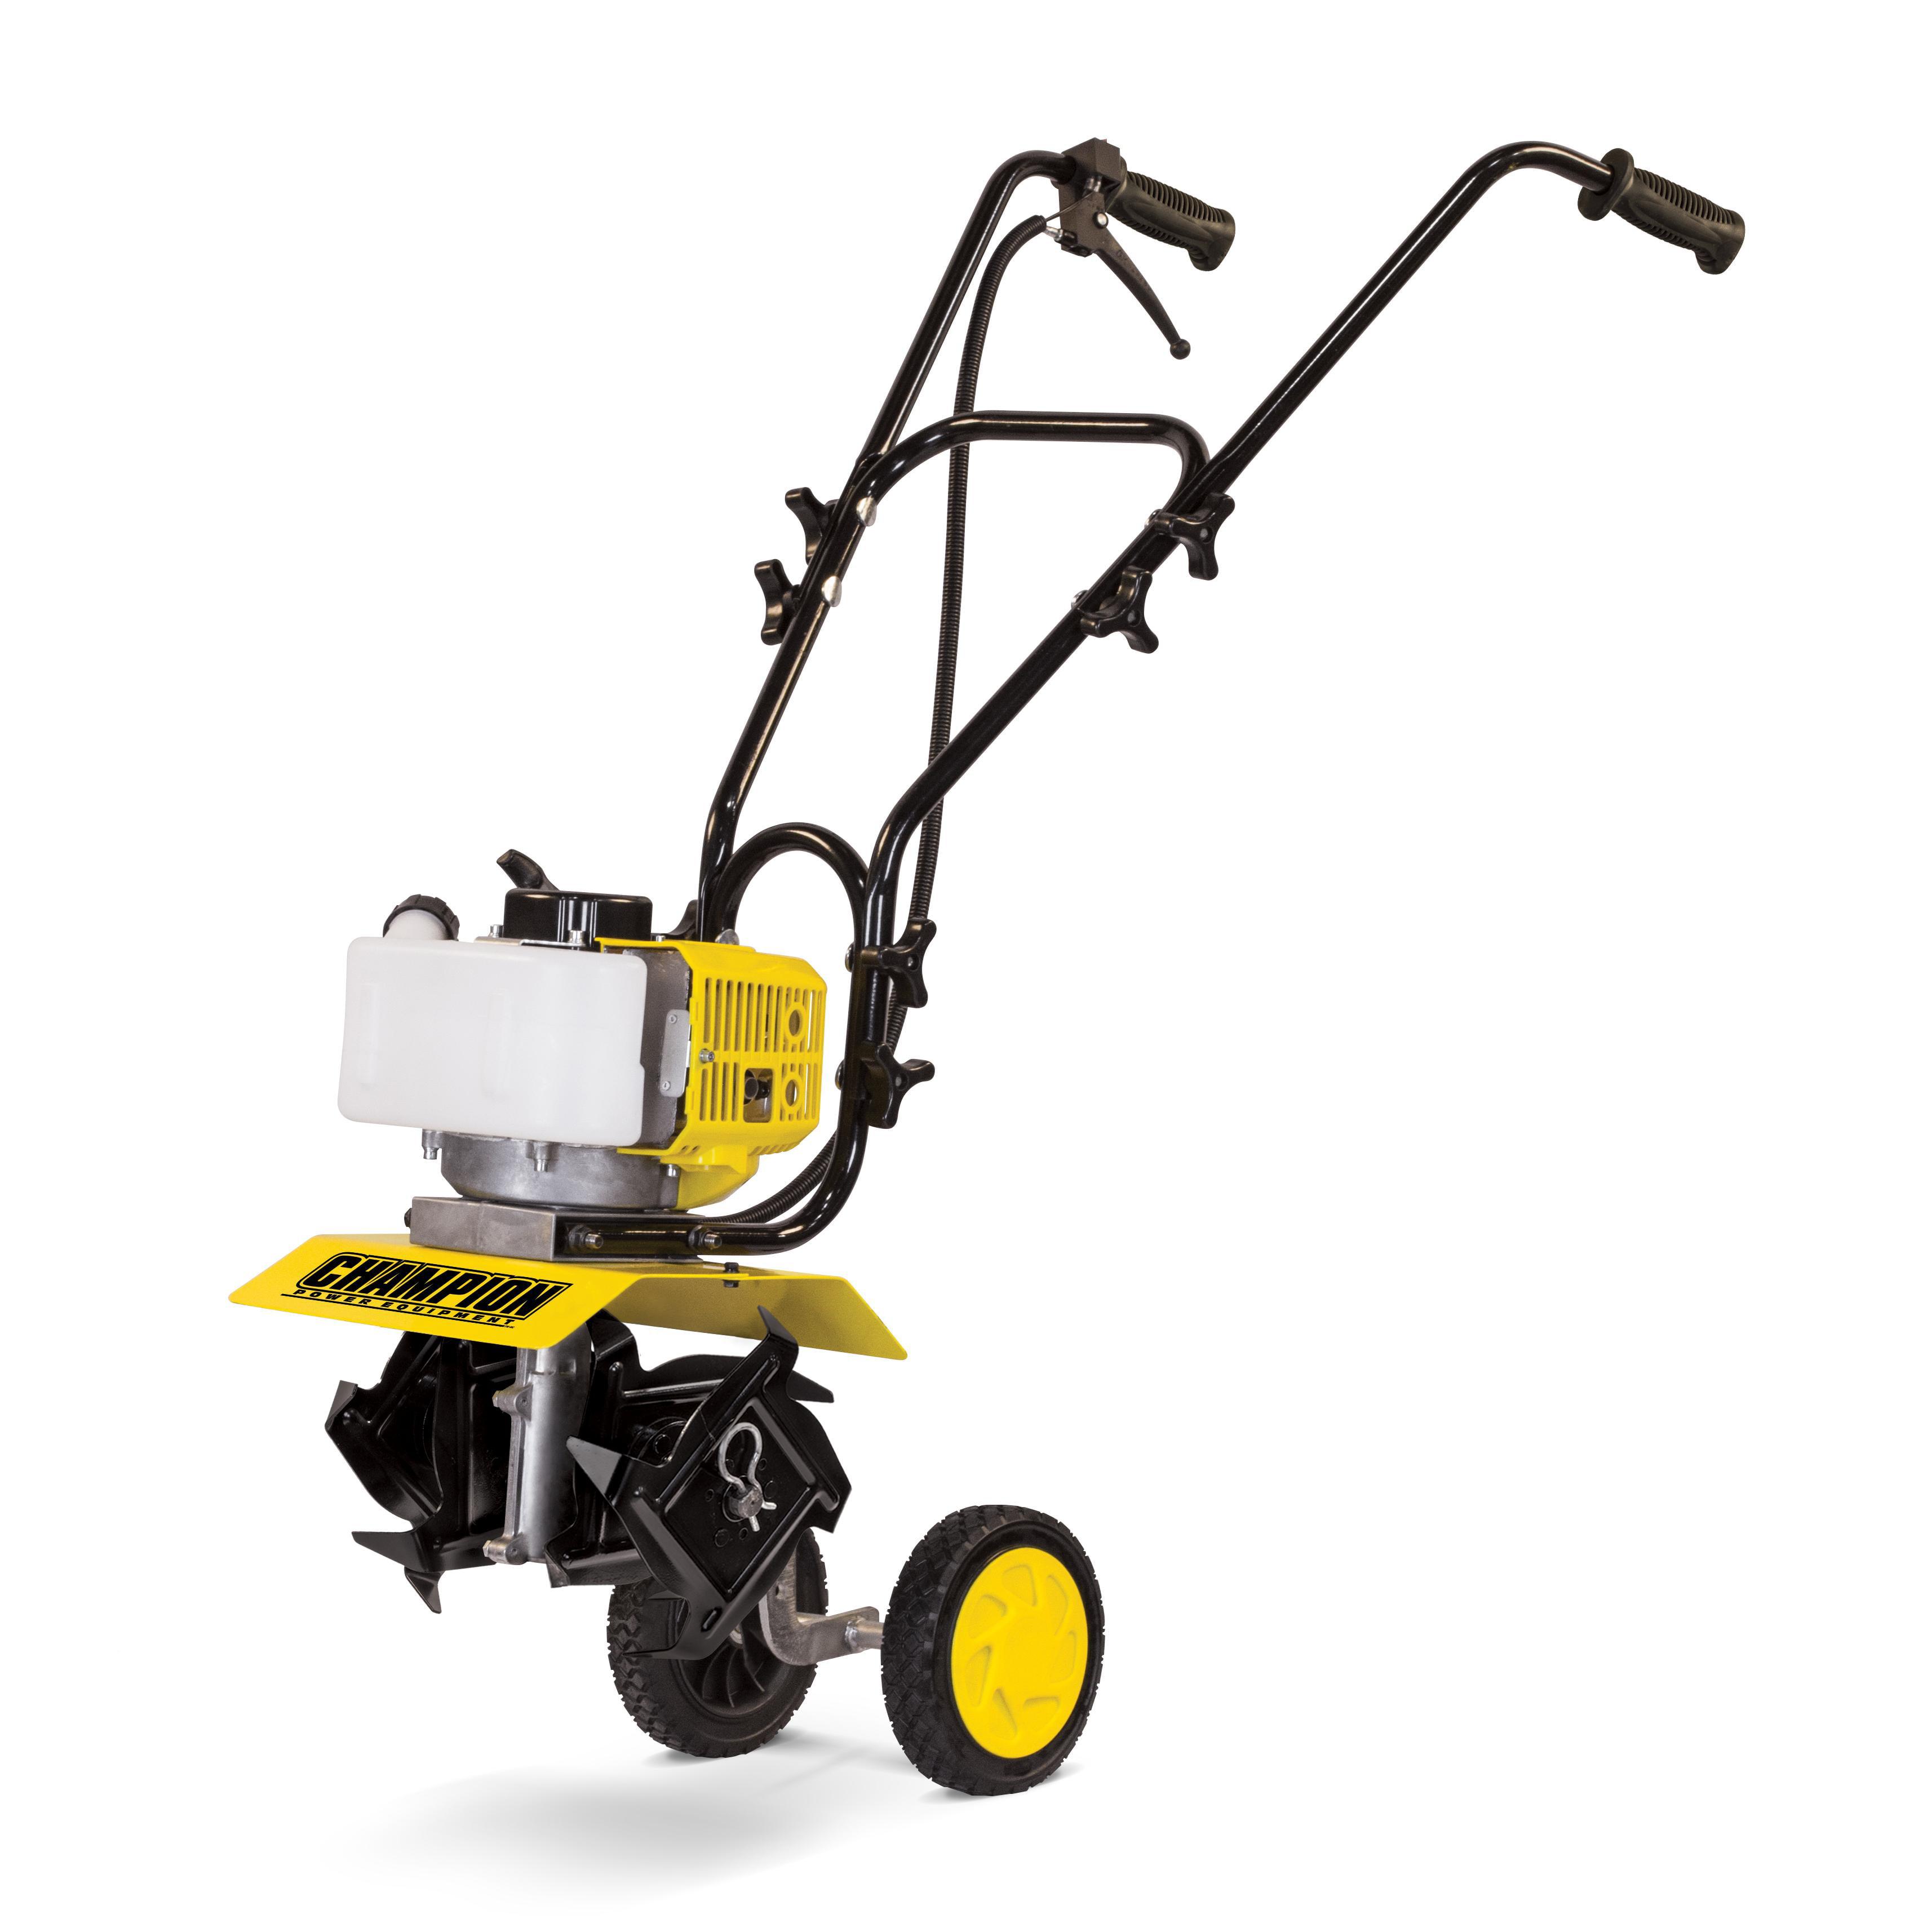 Best Gas Tillers - Champion 43cc 2-Stroke Portable Gas Garden Tiller Cultivator Review